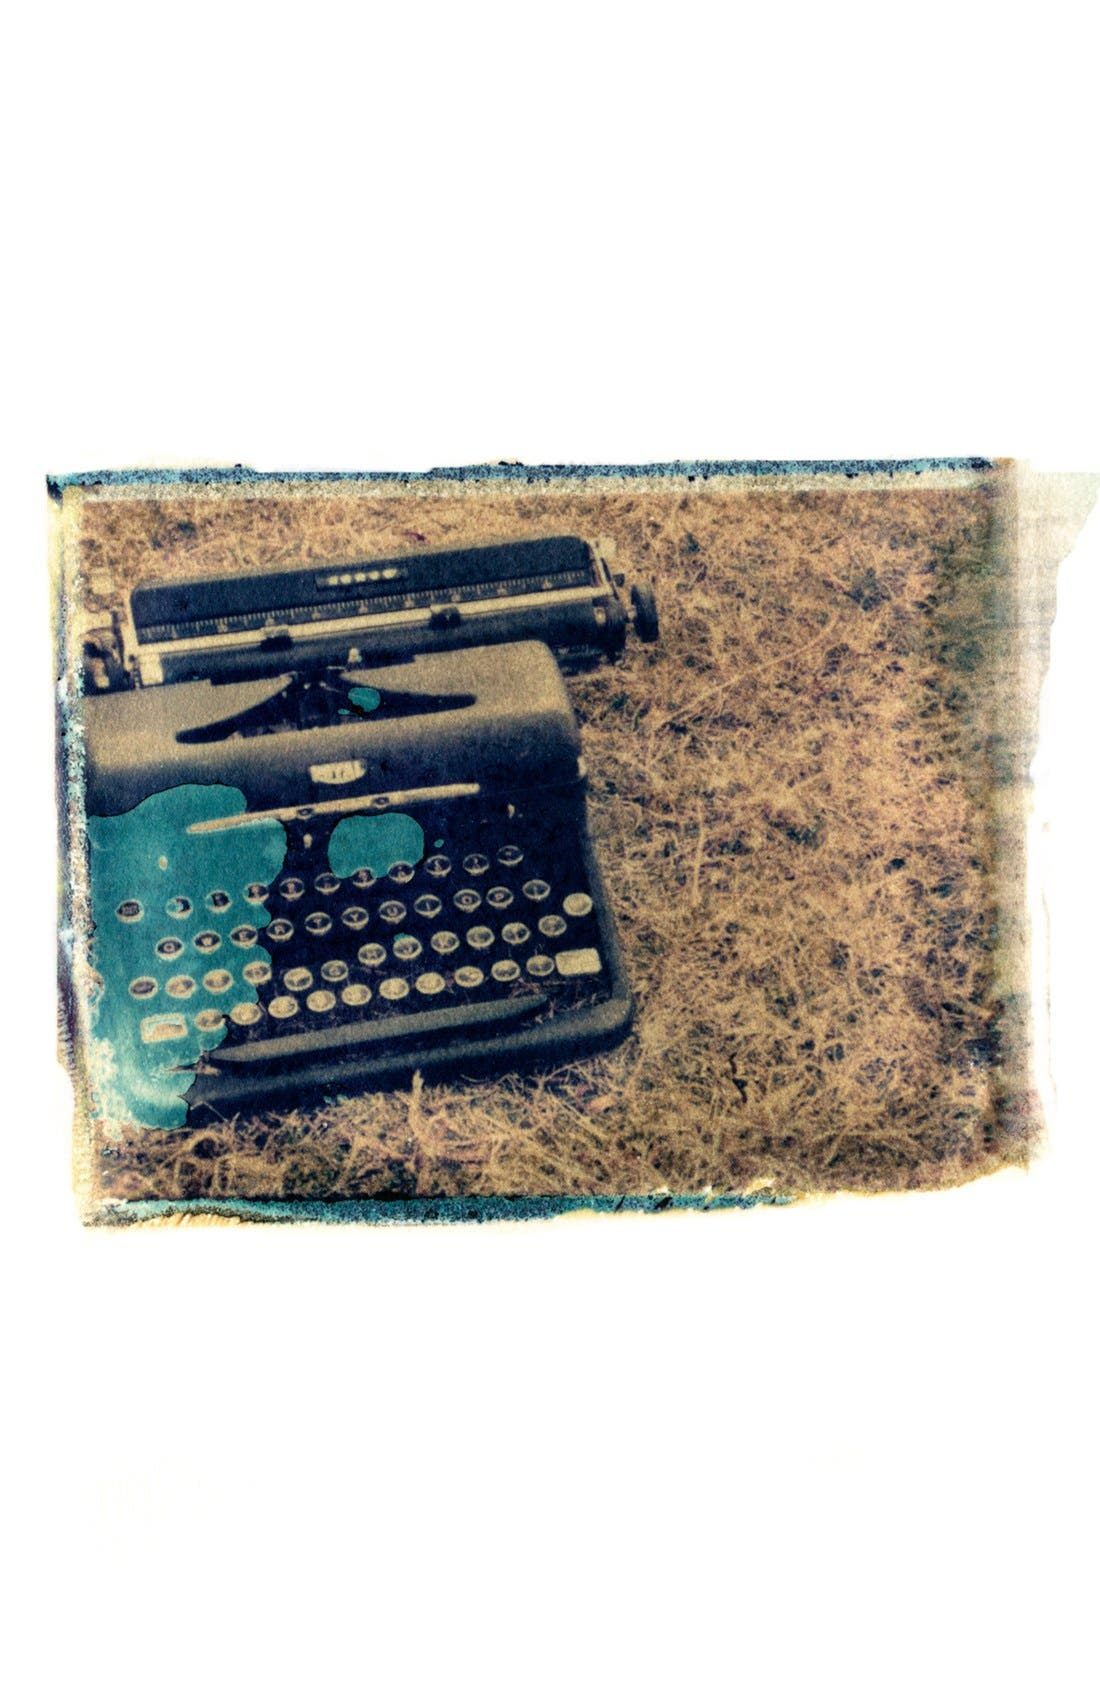 Main Image - She Hit Pause Studios 'Typewriter in Field' Wall Art